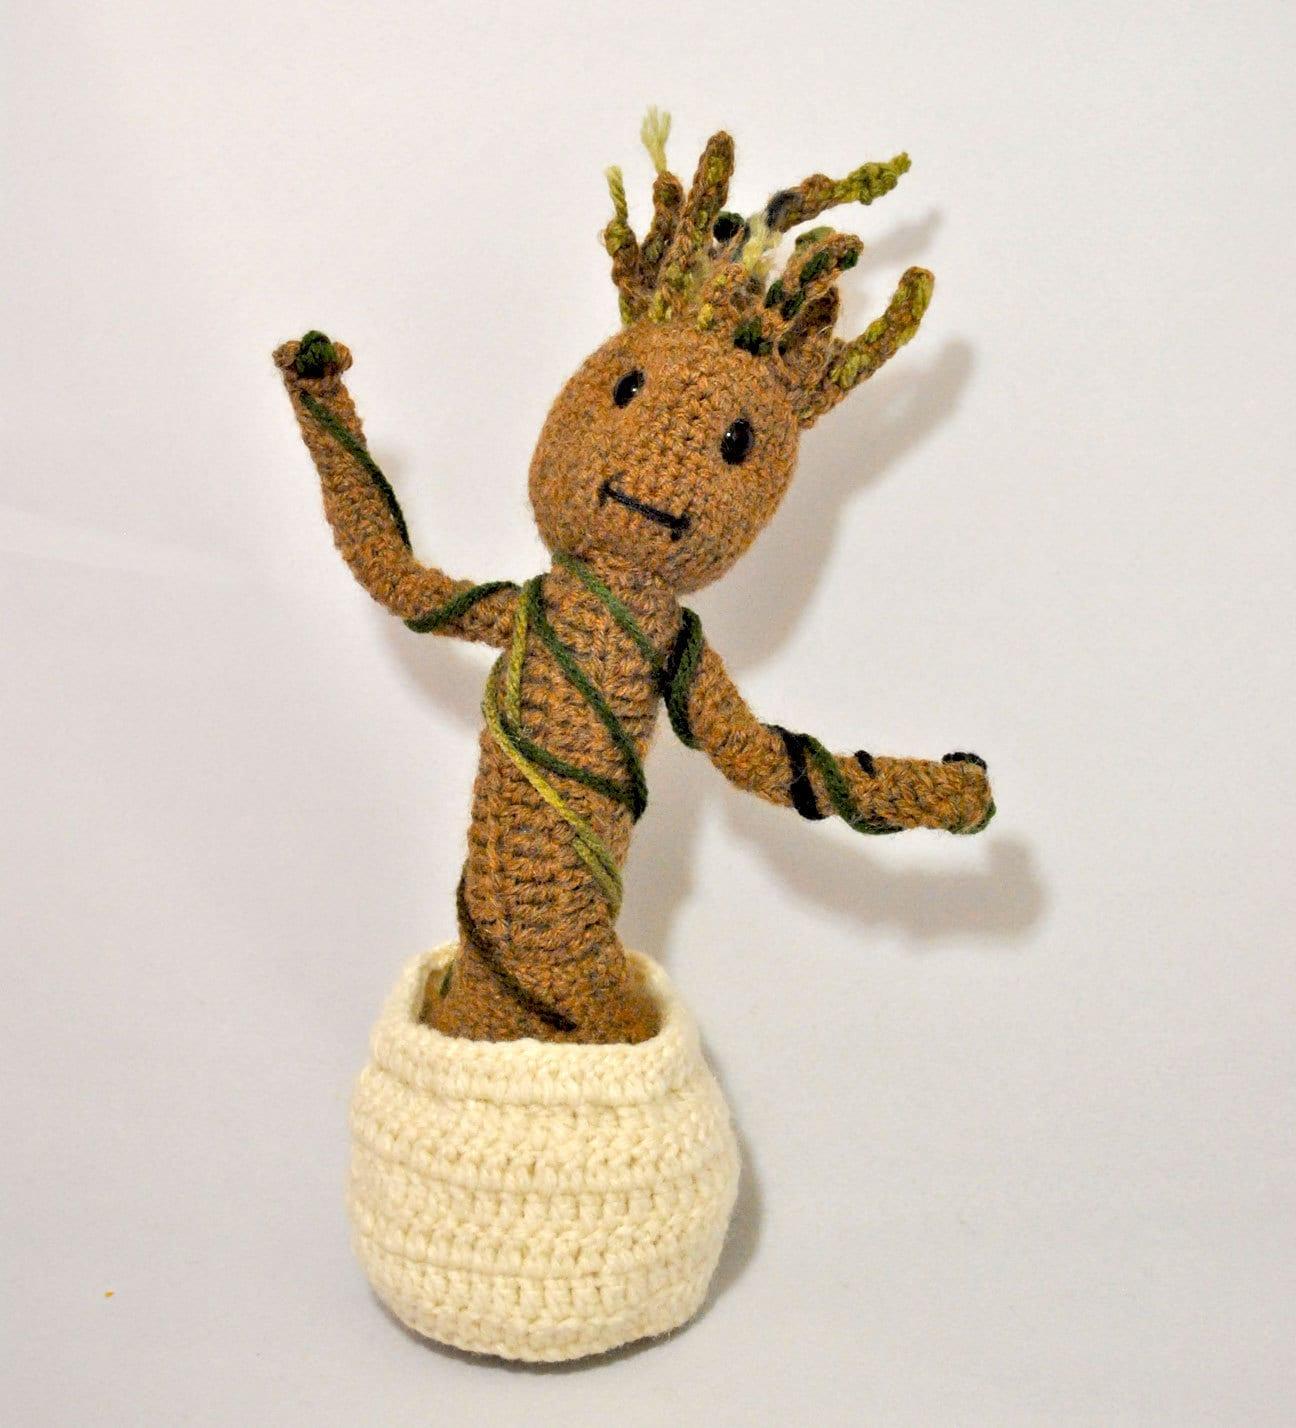 Amigurumi Patterns Groot : Crochet pattern baby groot amigurumi guadians of the